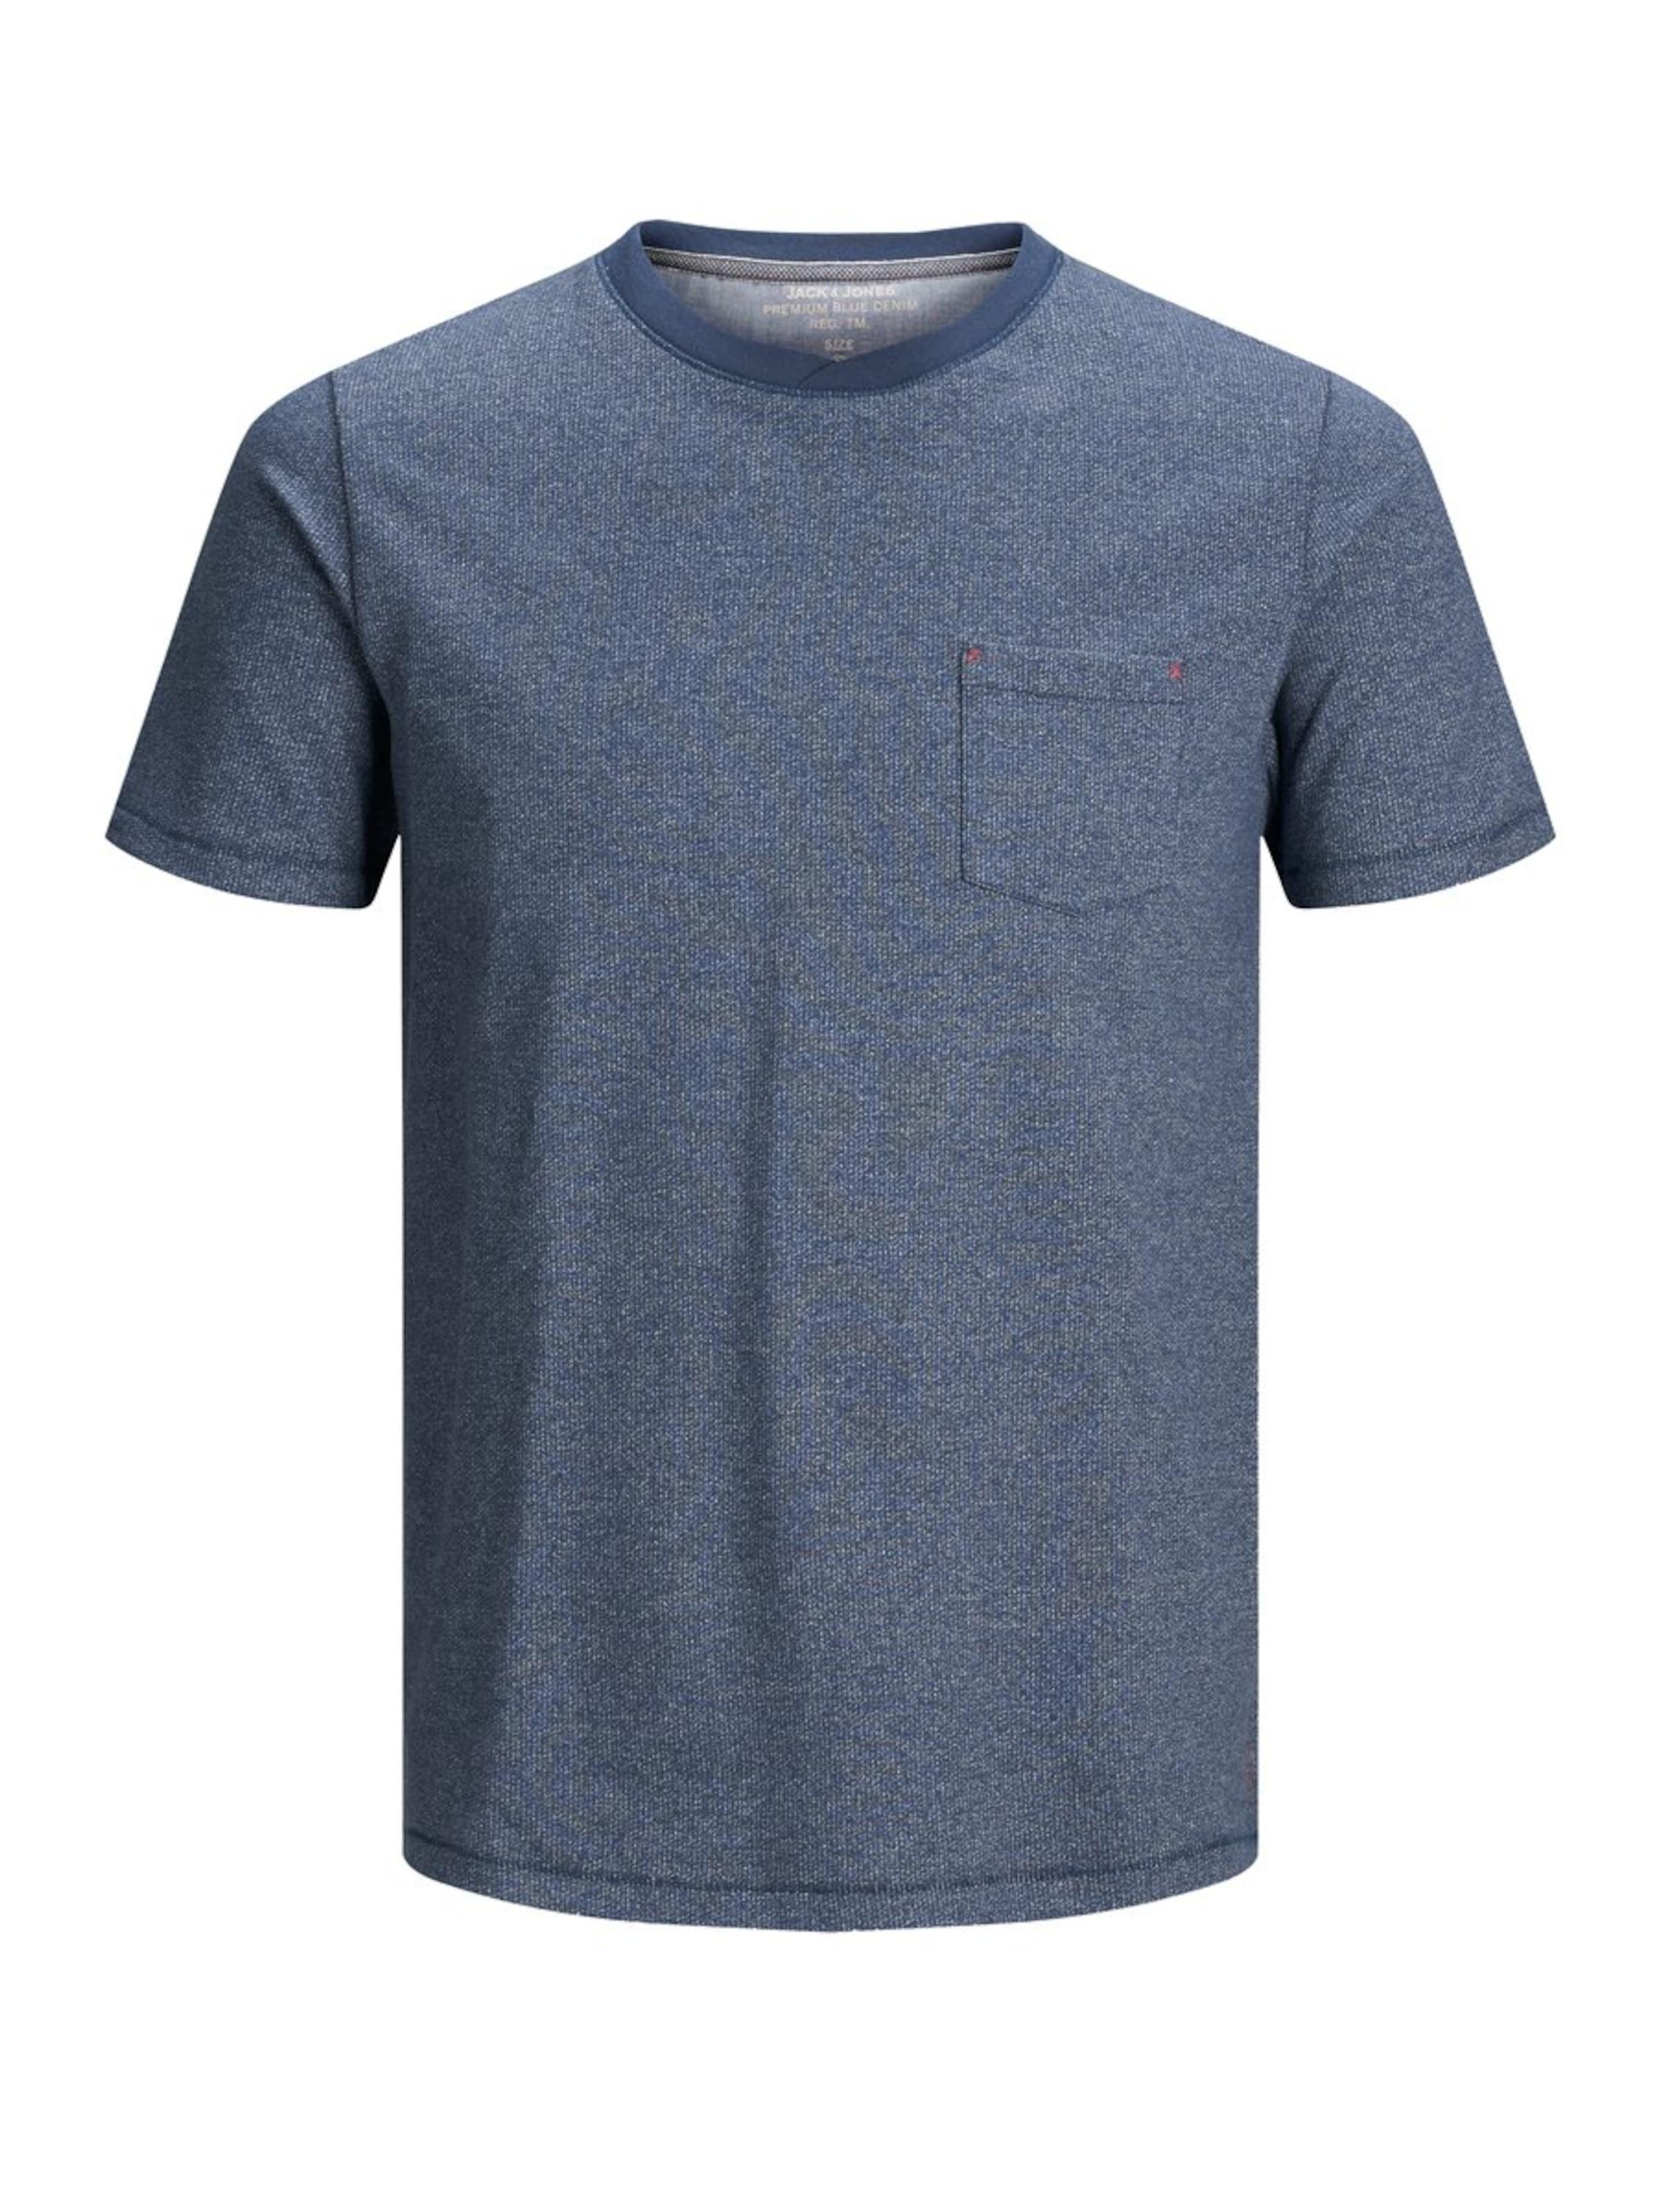 Jackamp; Marine shirt Jones En T Bleu doBeCx